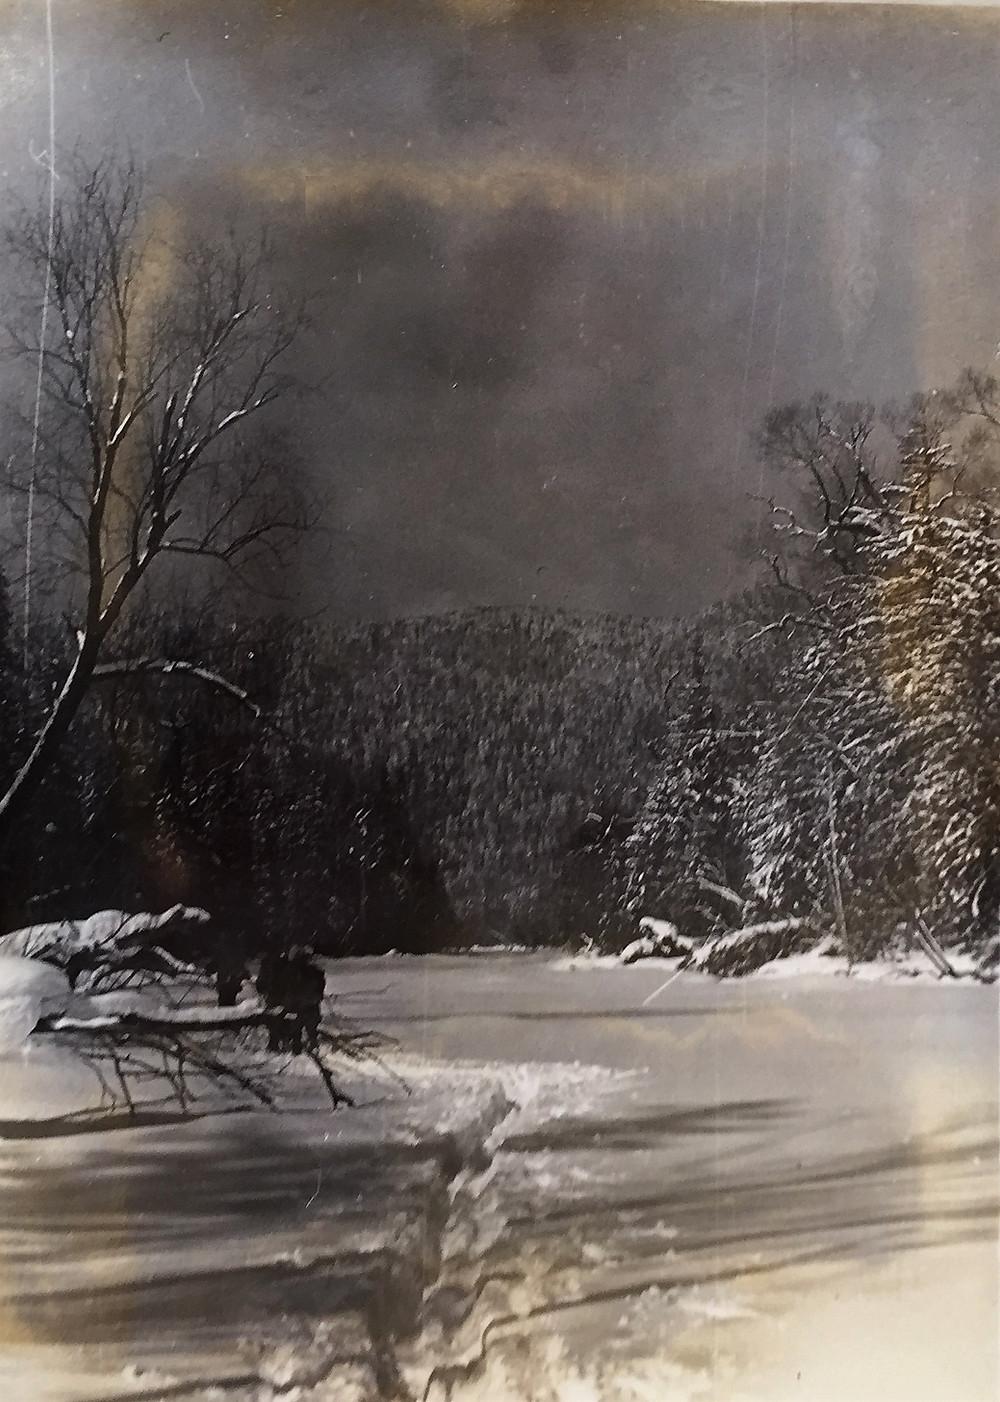 Река Хор  skitour.club  Блог Сергея Чеботова